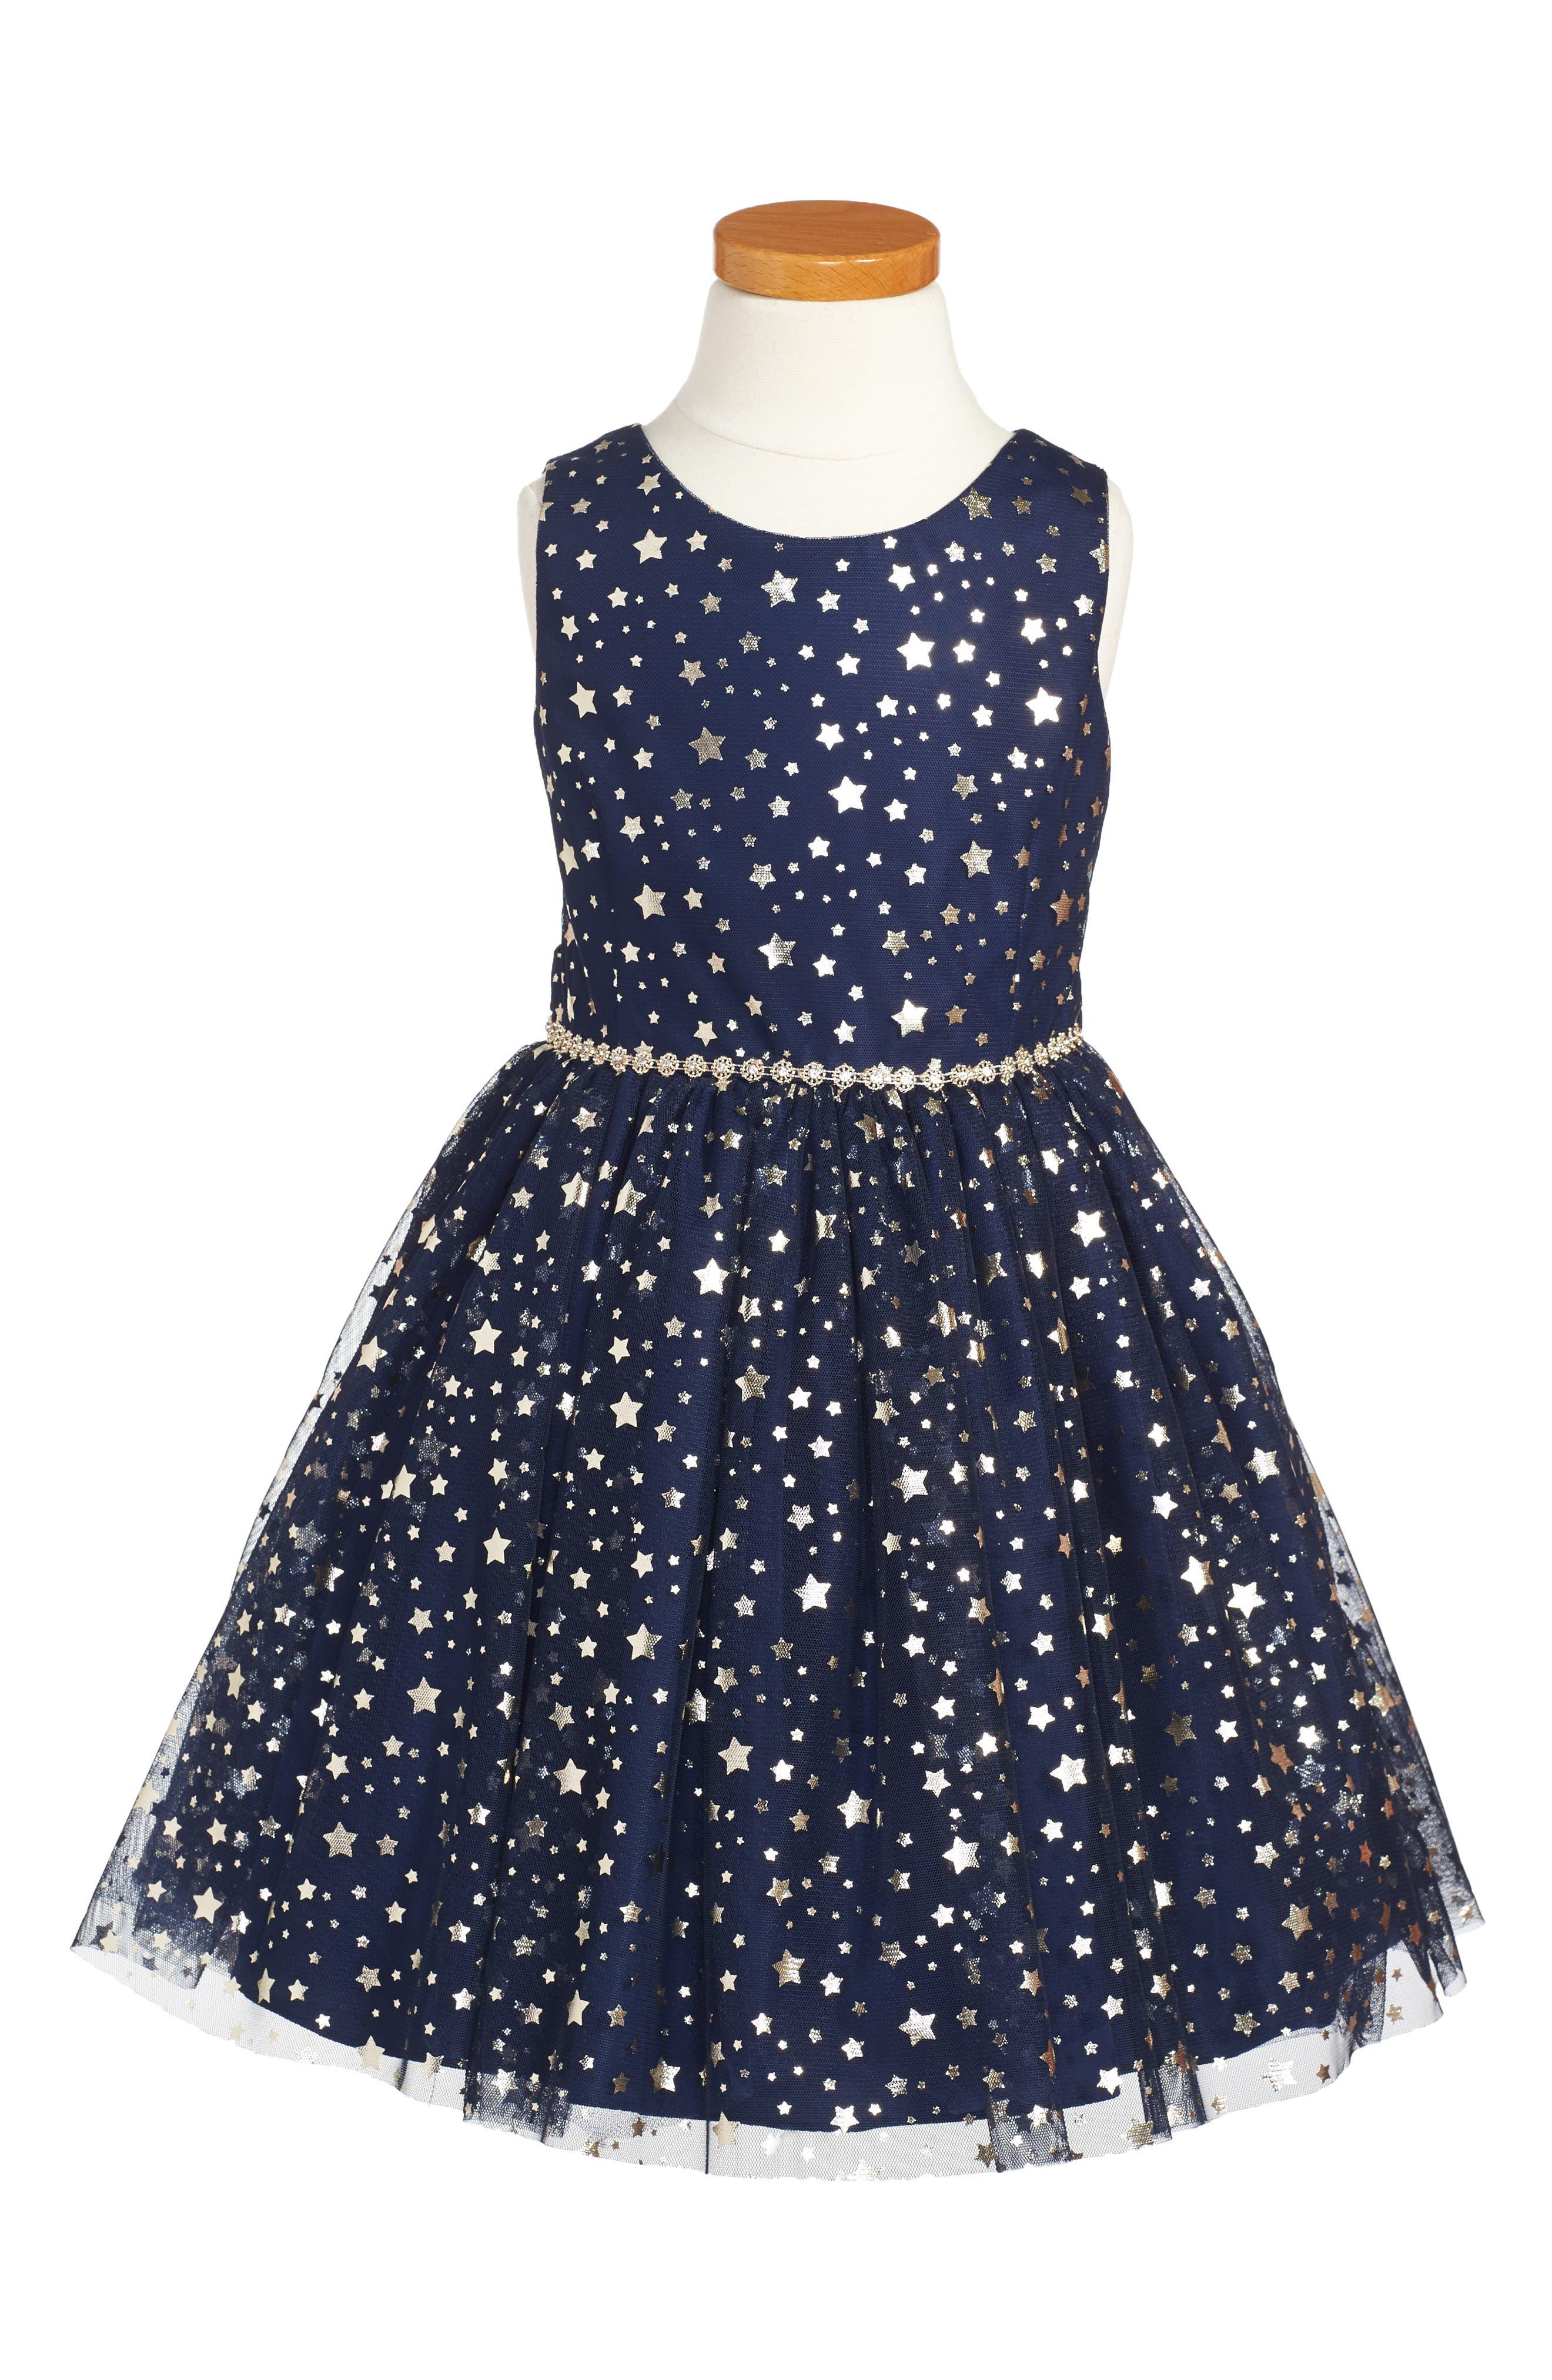 Alternate Image 1 Selected - Pippa & Julie Metallic Stars Party Dress (Toddler Girls, Little Girls & Big Girls)